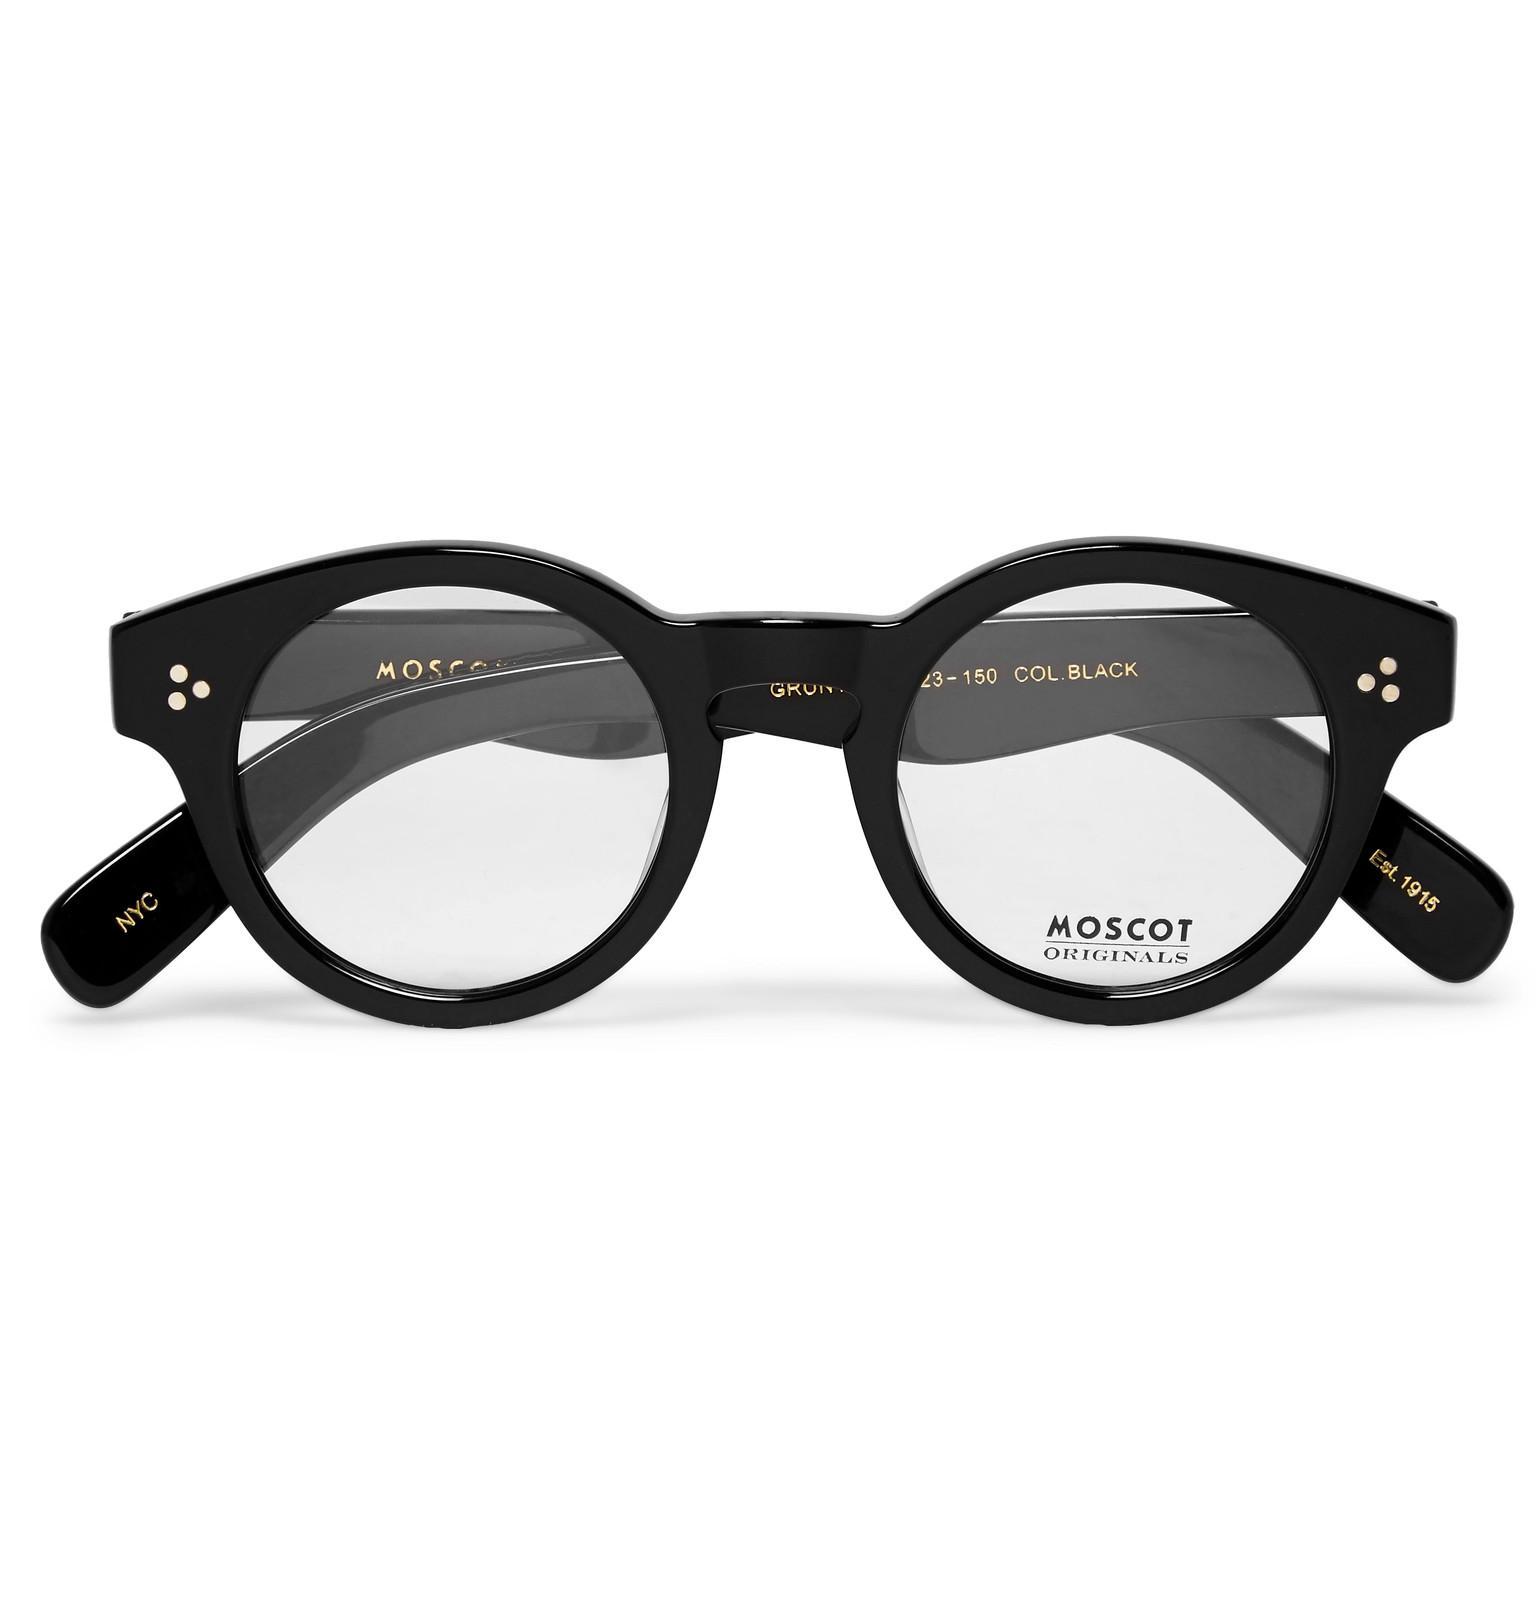 20e10f3a441e Moscot Grunya Round-frame Acetate Optical Glasses in Black for Men ...